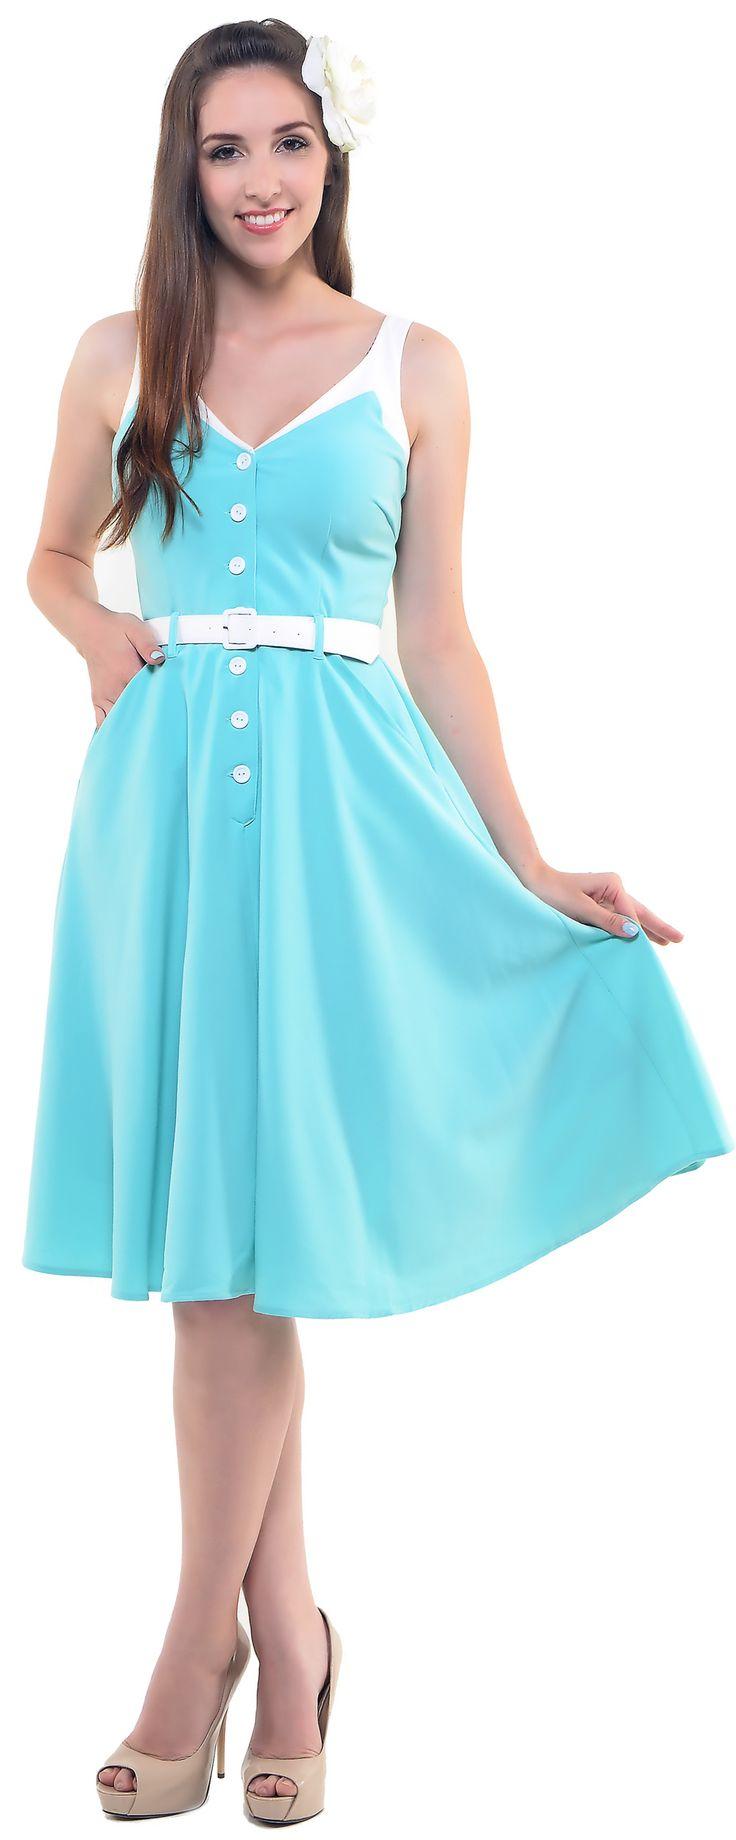 104 best wanted clothes images on Pinterest | Retro vintage dresses ...